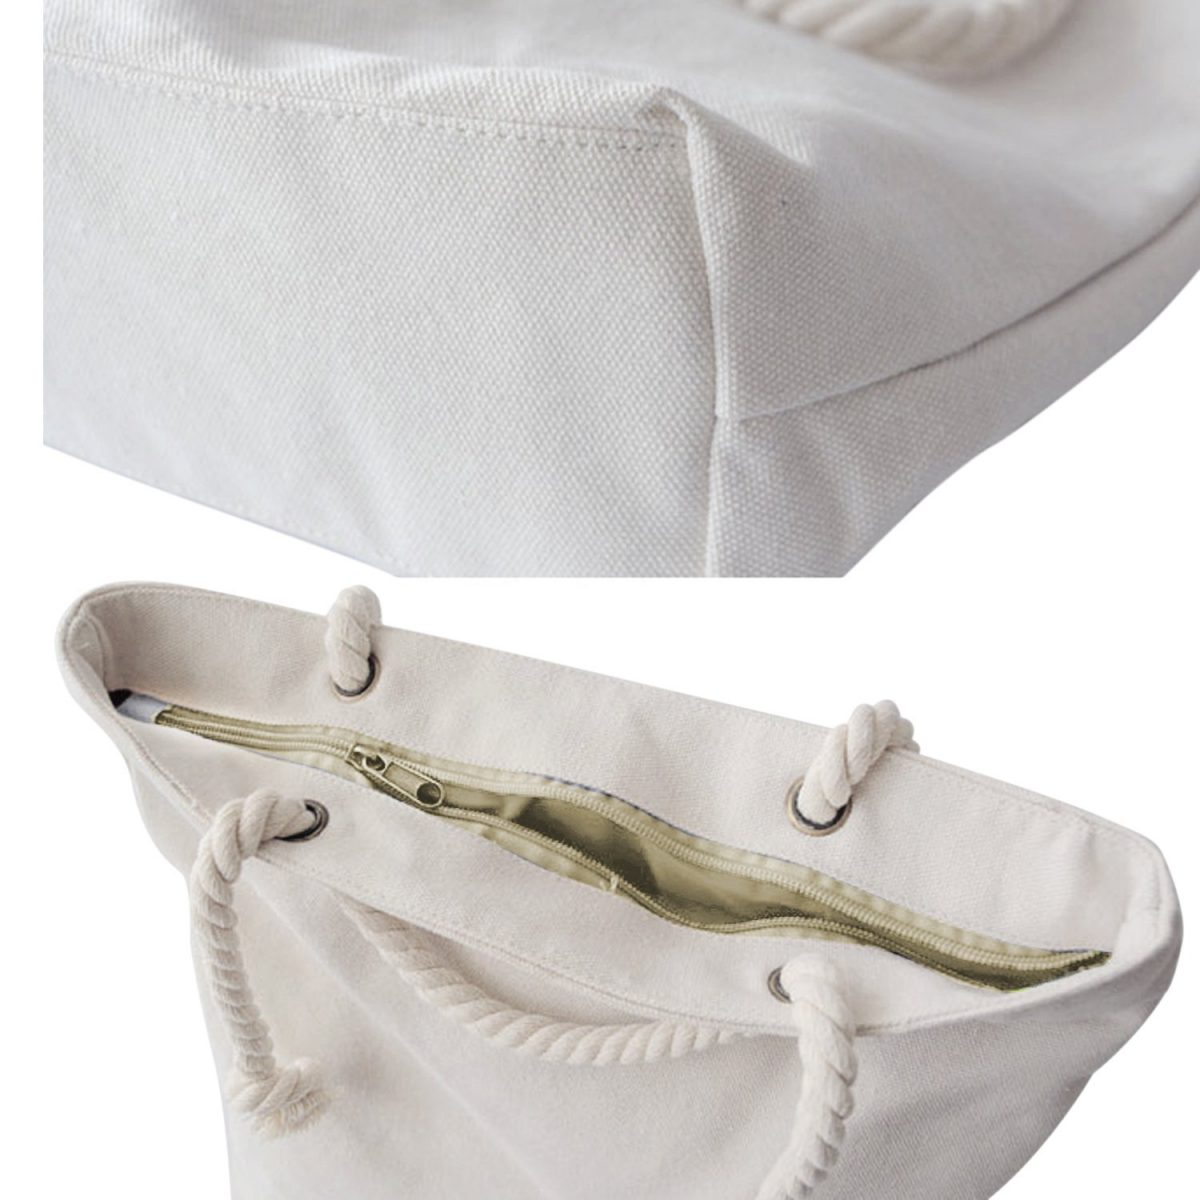 Geometrik Ananas Desenli Dkeoratif Fermuarlı Kumaş Çanta Realhomes